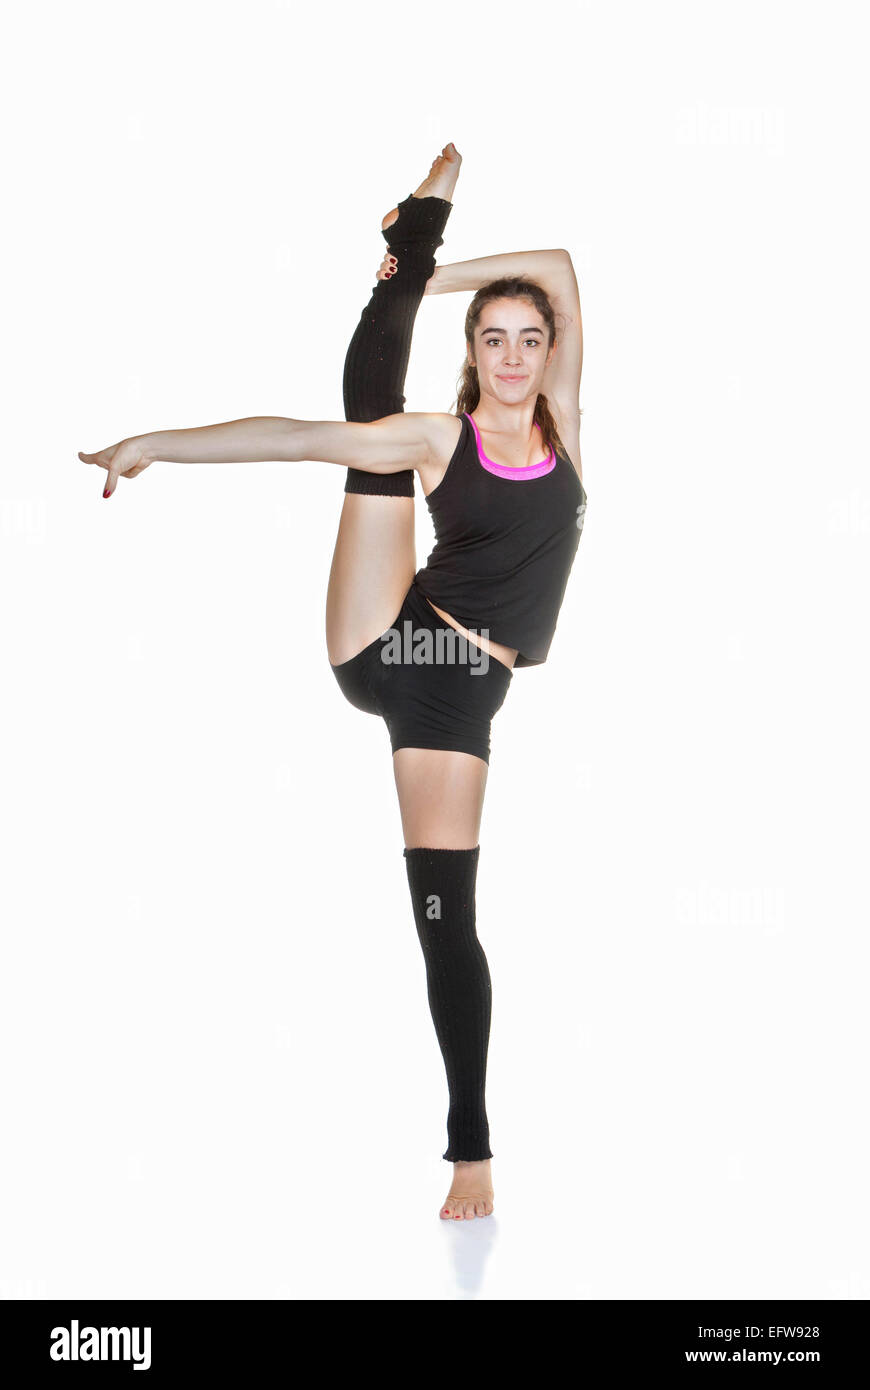 flexible teen ballet dancer stretching exercise - Stock Image